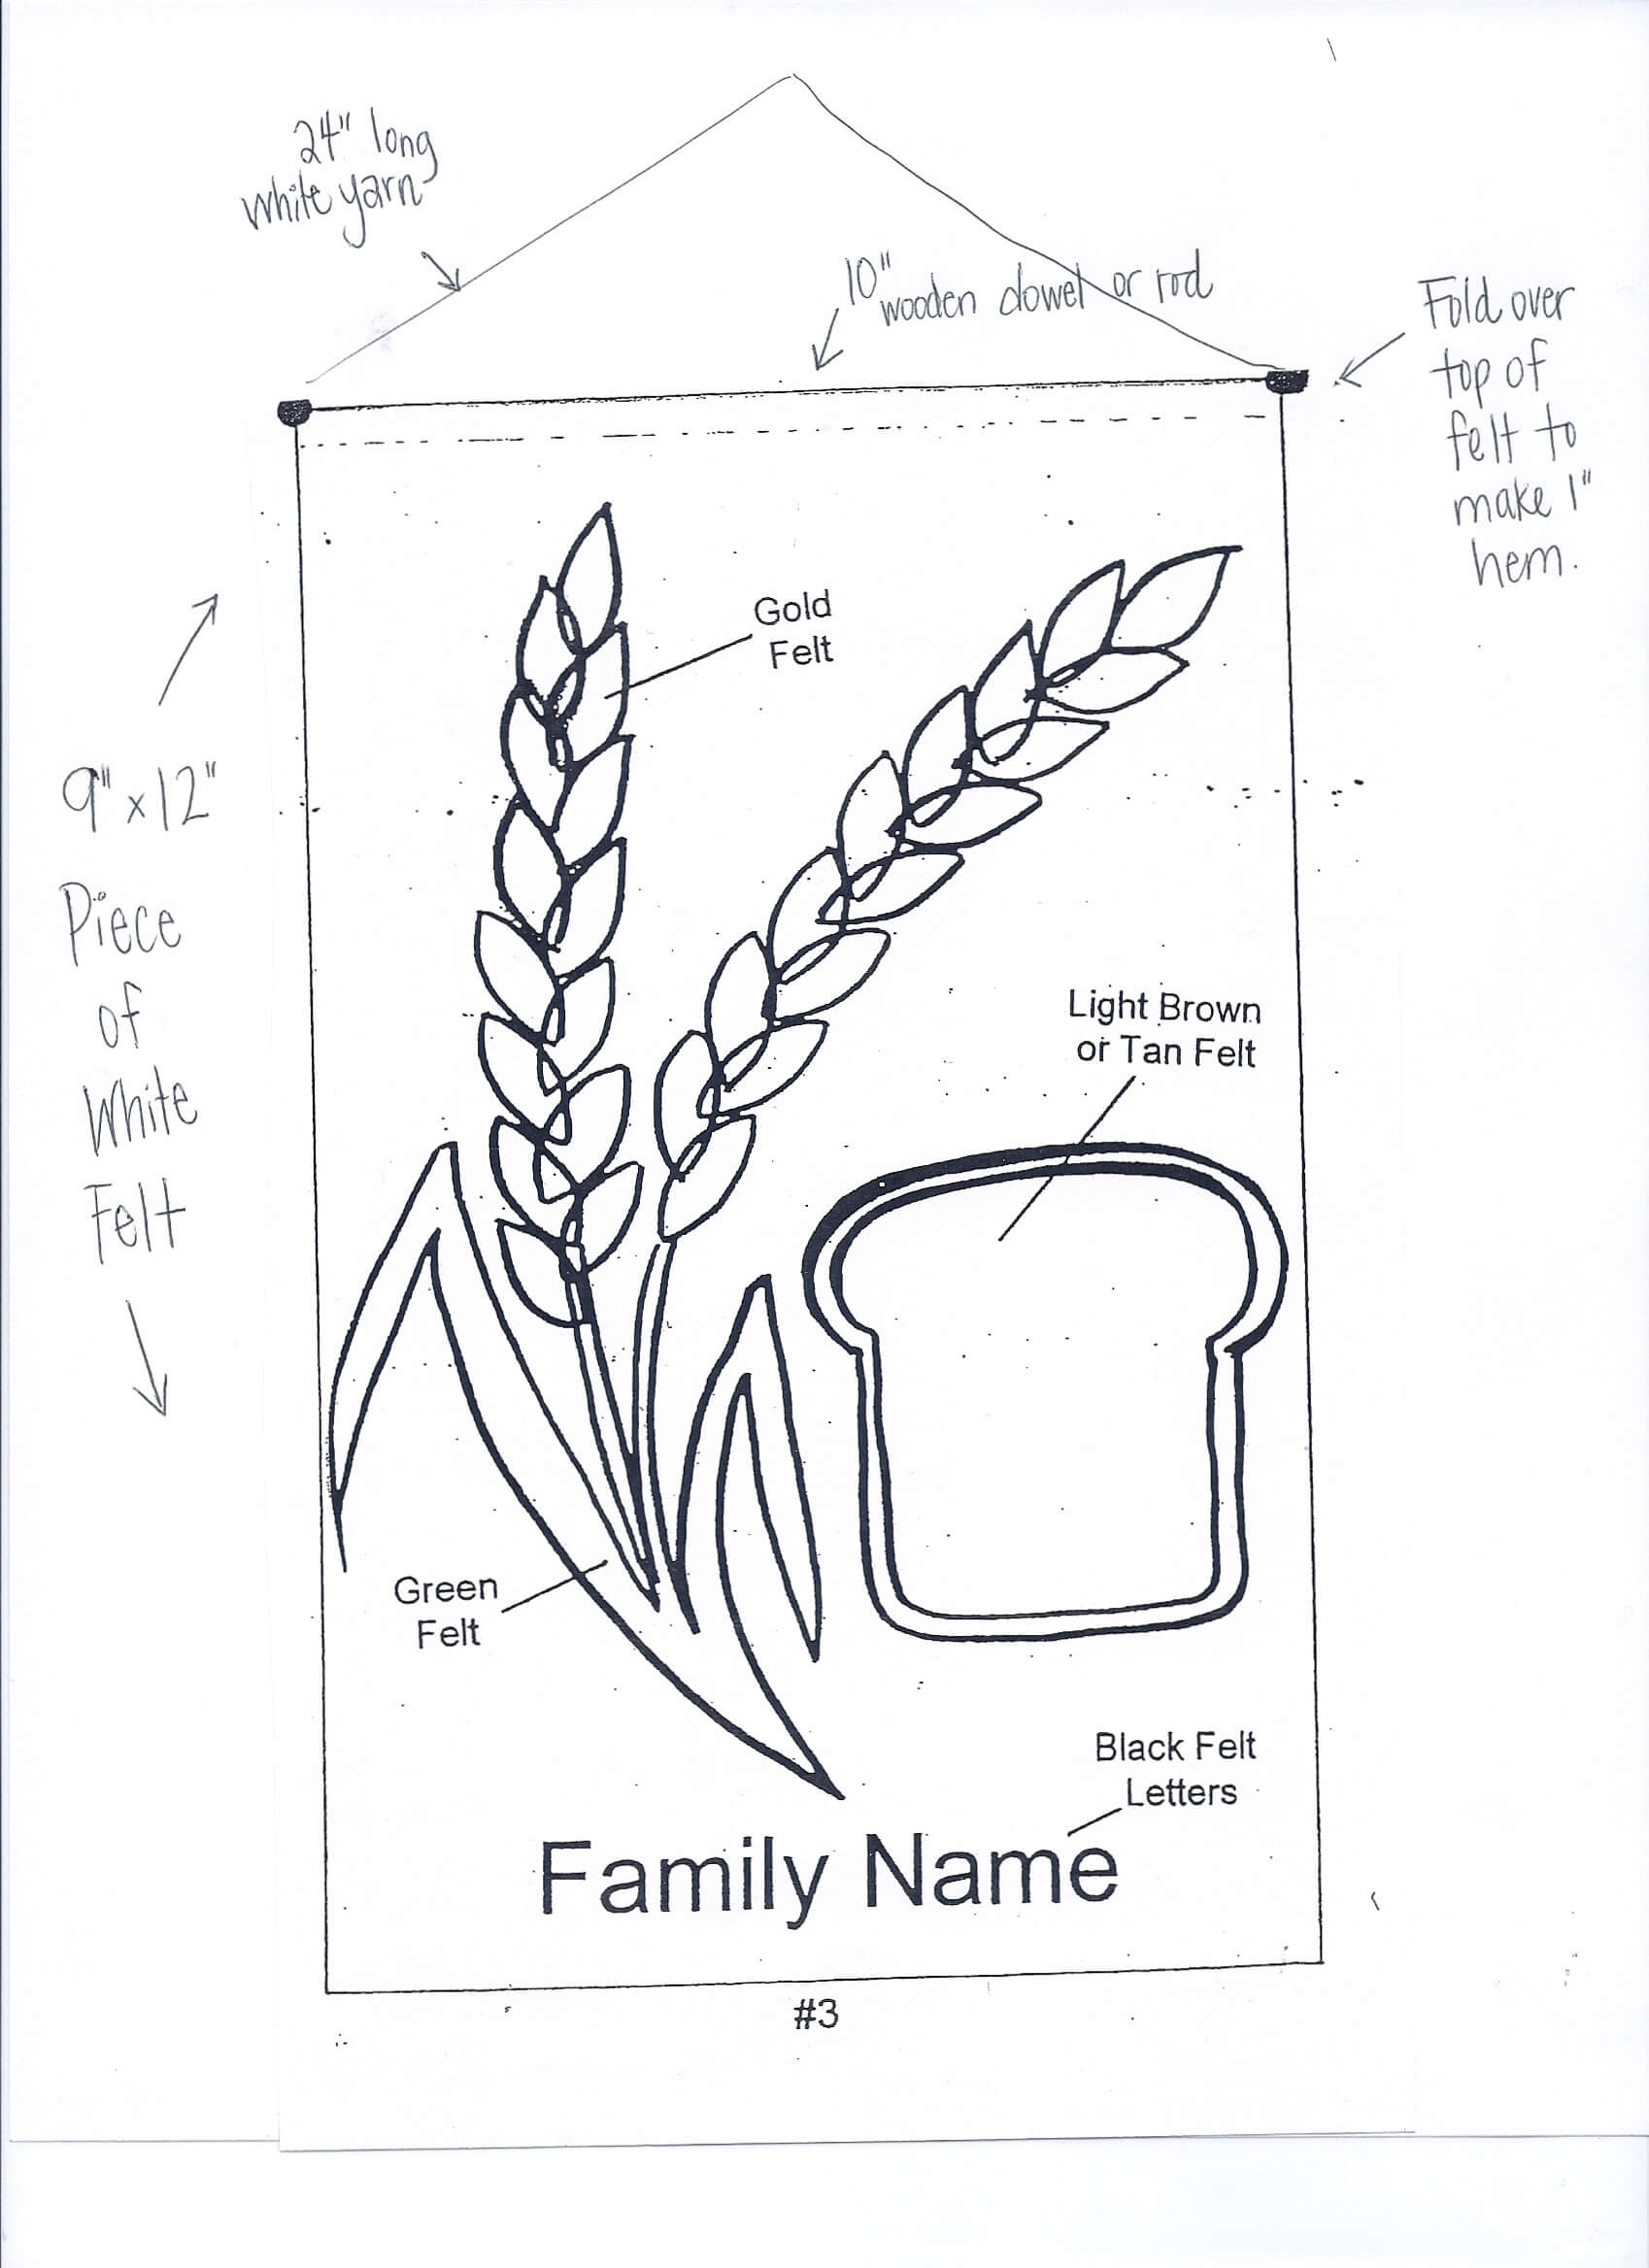 First Communion Banner - Sacred Heart School - Mount Holly, Nj For First Communion Banner Templates